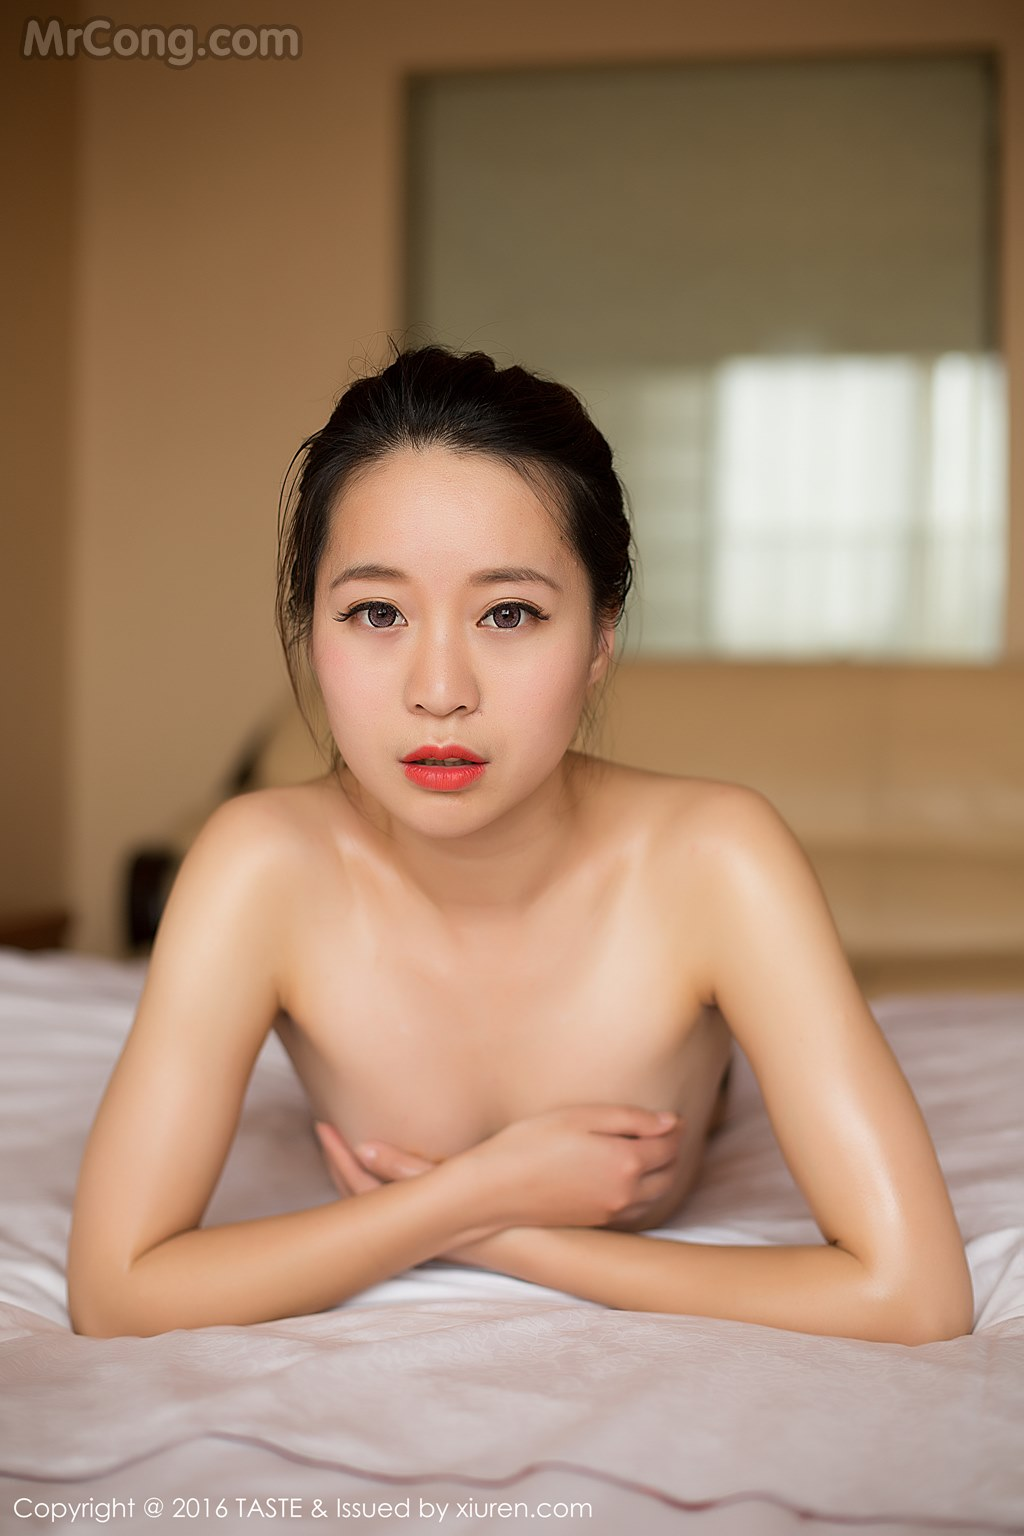 Image MrCong.com-TASTE-Vol.017-NIKO-Xiao-Yue-Yue-014 in post TASTE Vol.017: Người mẫu NIKO (小玥玥) (50 ảnh)